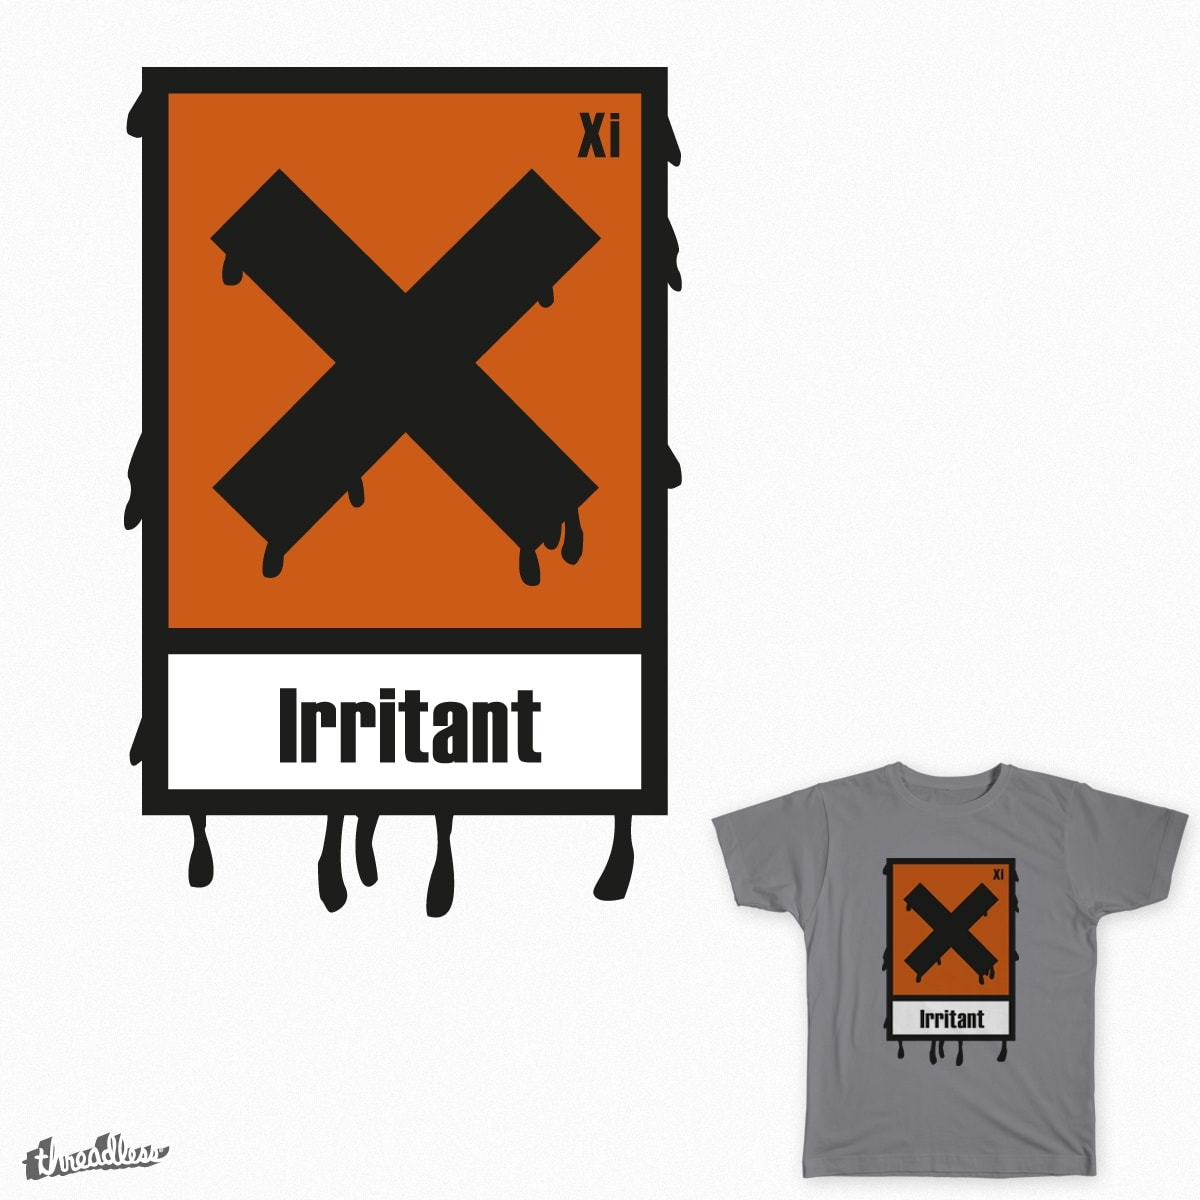 Irritant by Brandon-Joyce on Threadless